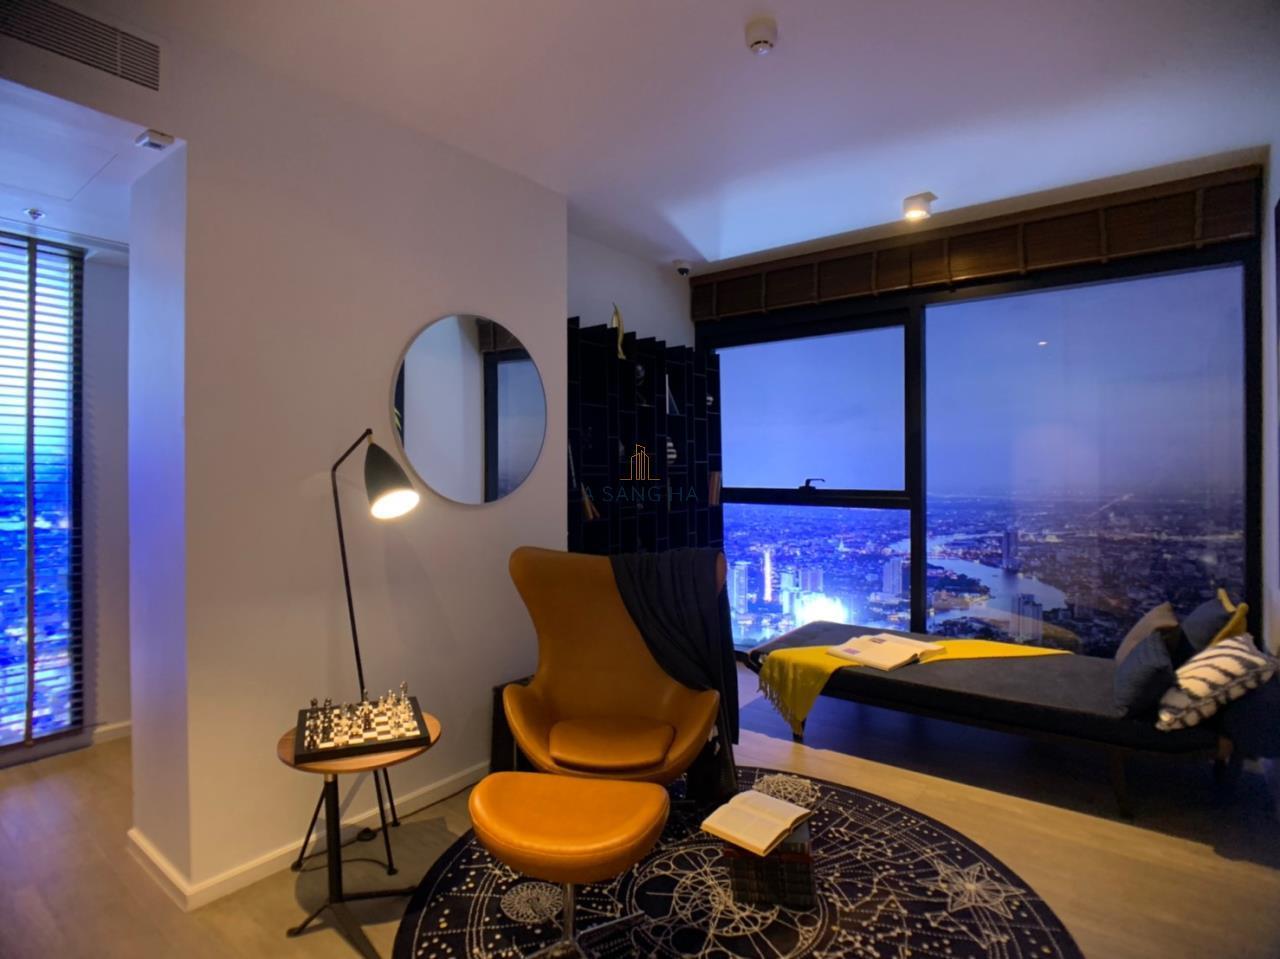 Asangha Realty Agency's [Sale] The Loft Siom Sliom 2 BRS Duplex 5